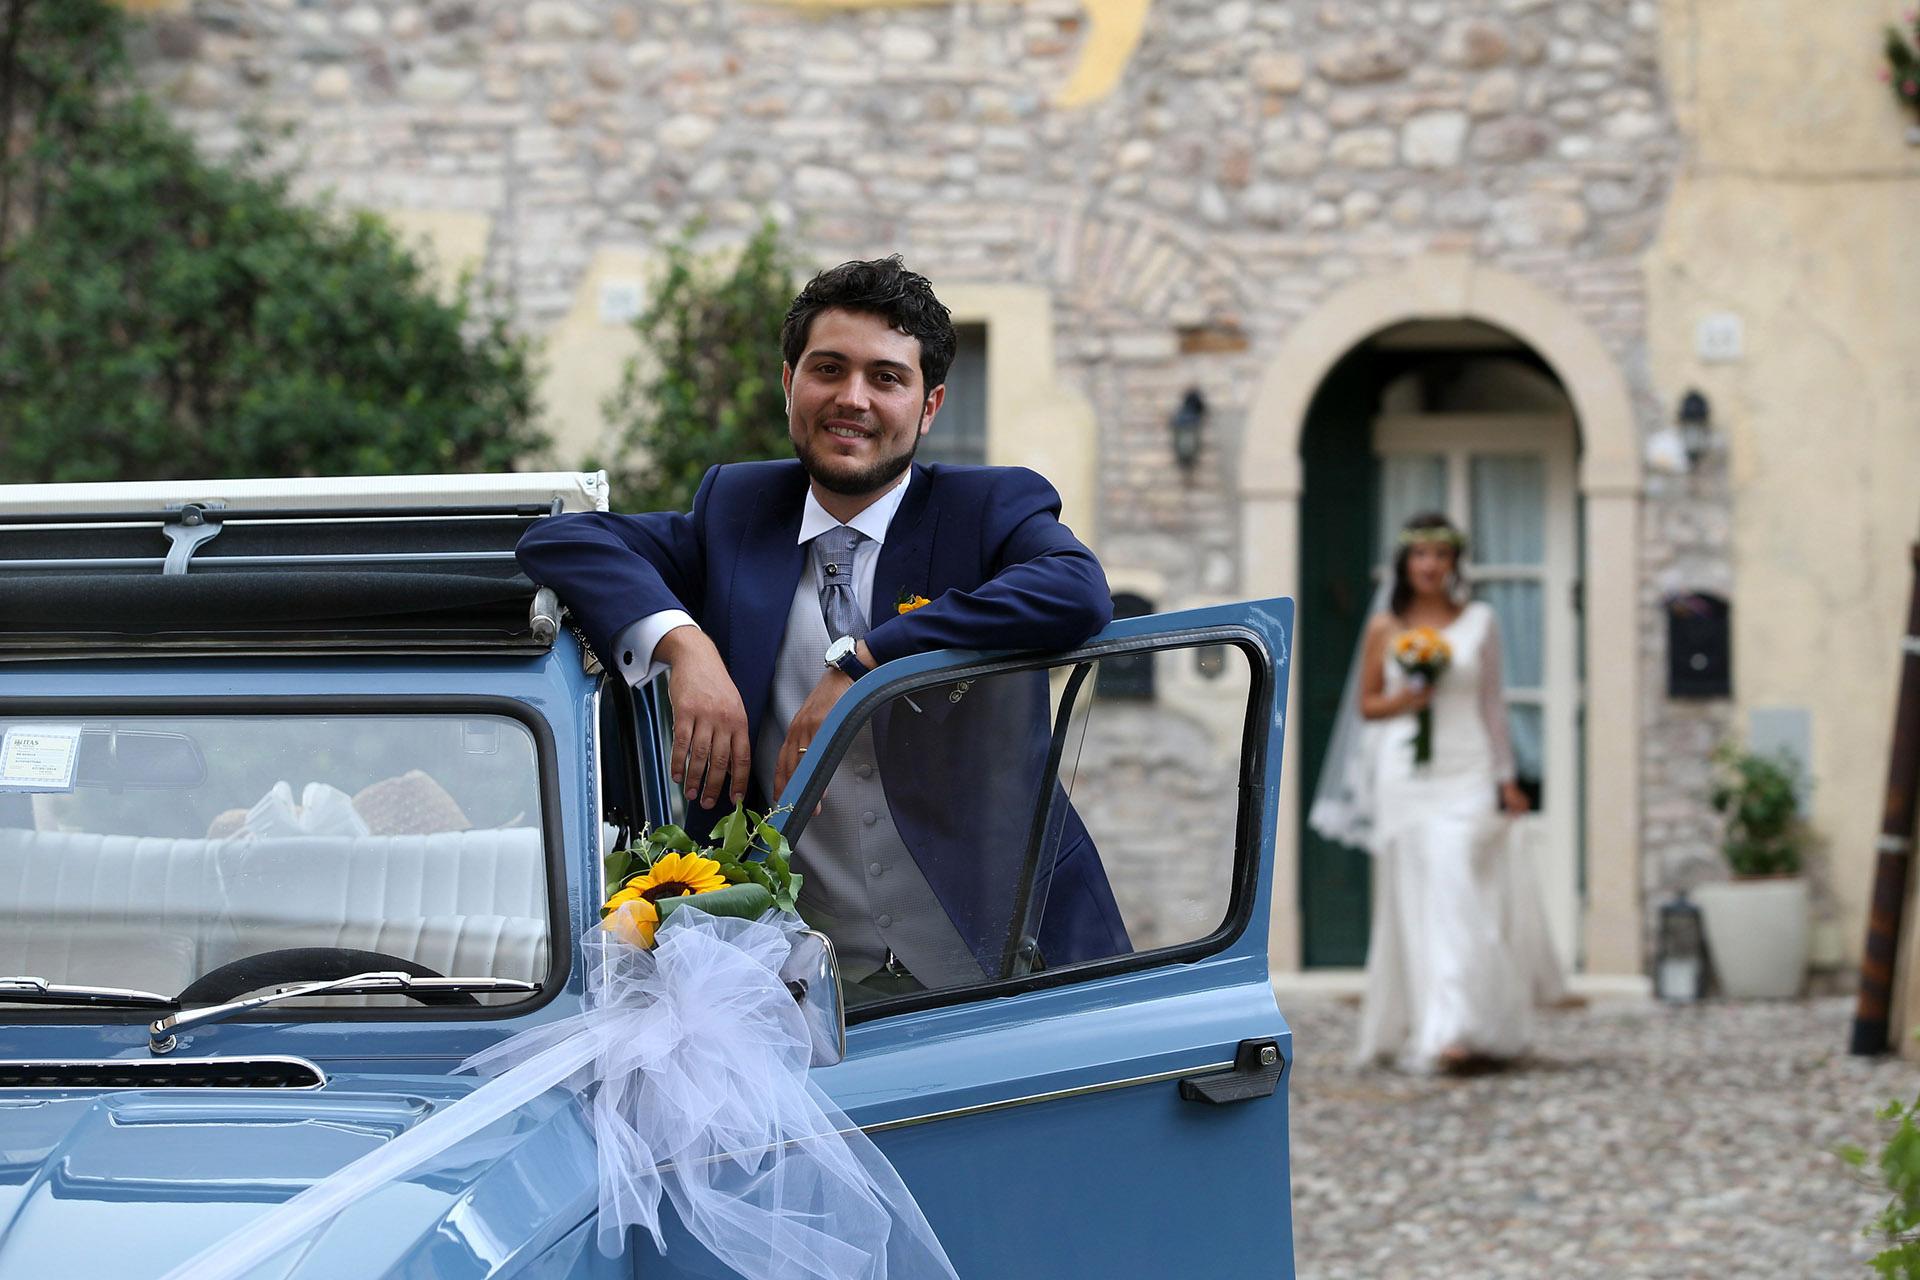 Matrimonio Erika & Patrizio a Corte Francesco, Montichiari (BS) - L'Uomo Griffe Boutique